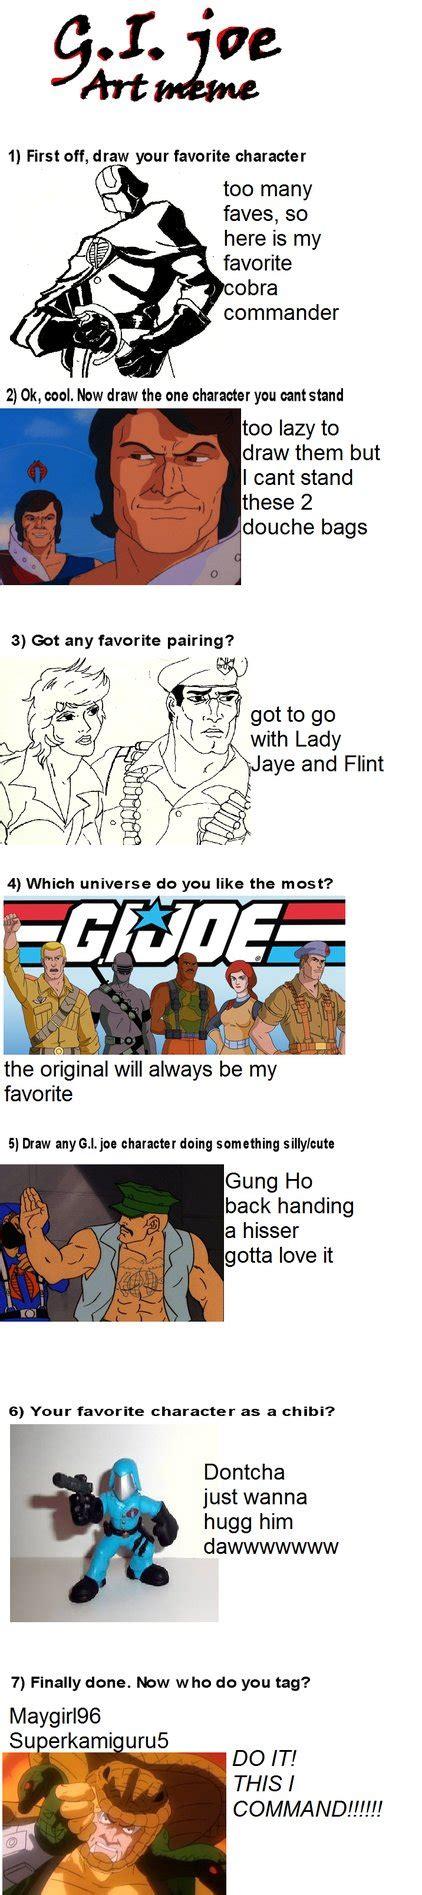 Gi Joe Meme - gi joe meme by lovefistfury on deviantart